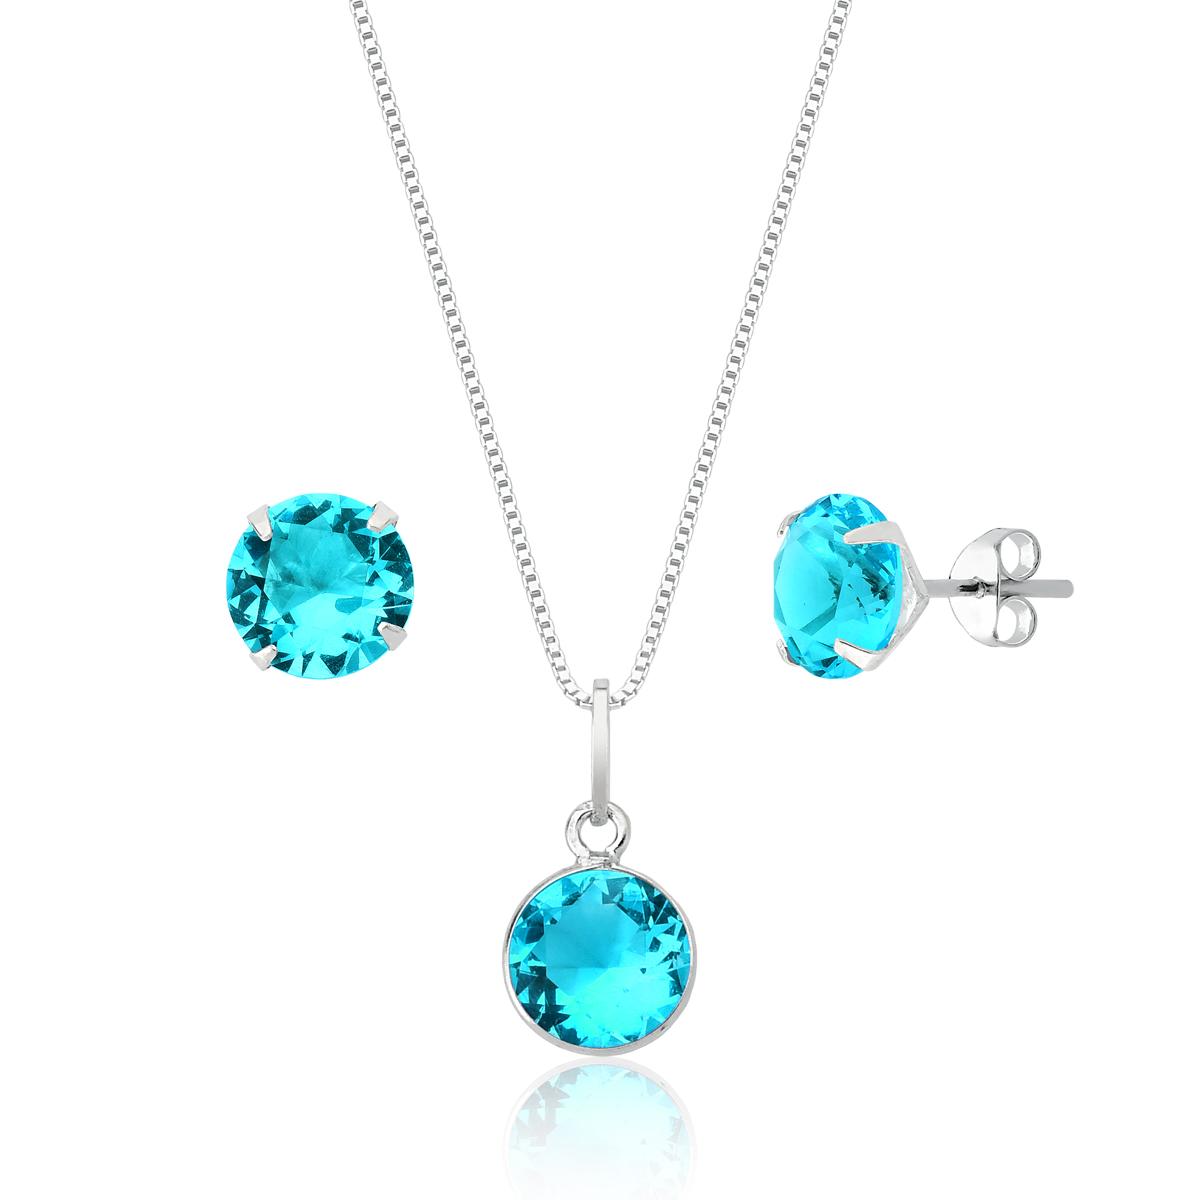 Conjunto Ponto de Cristal Azul Claro